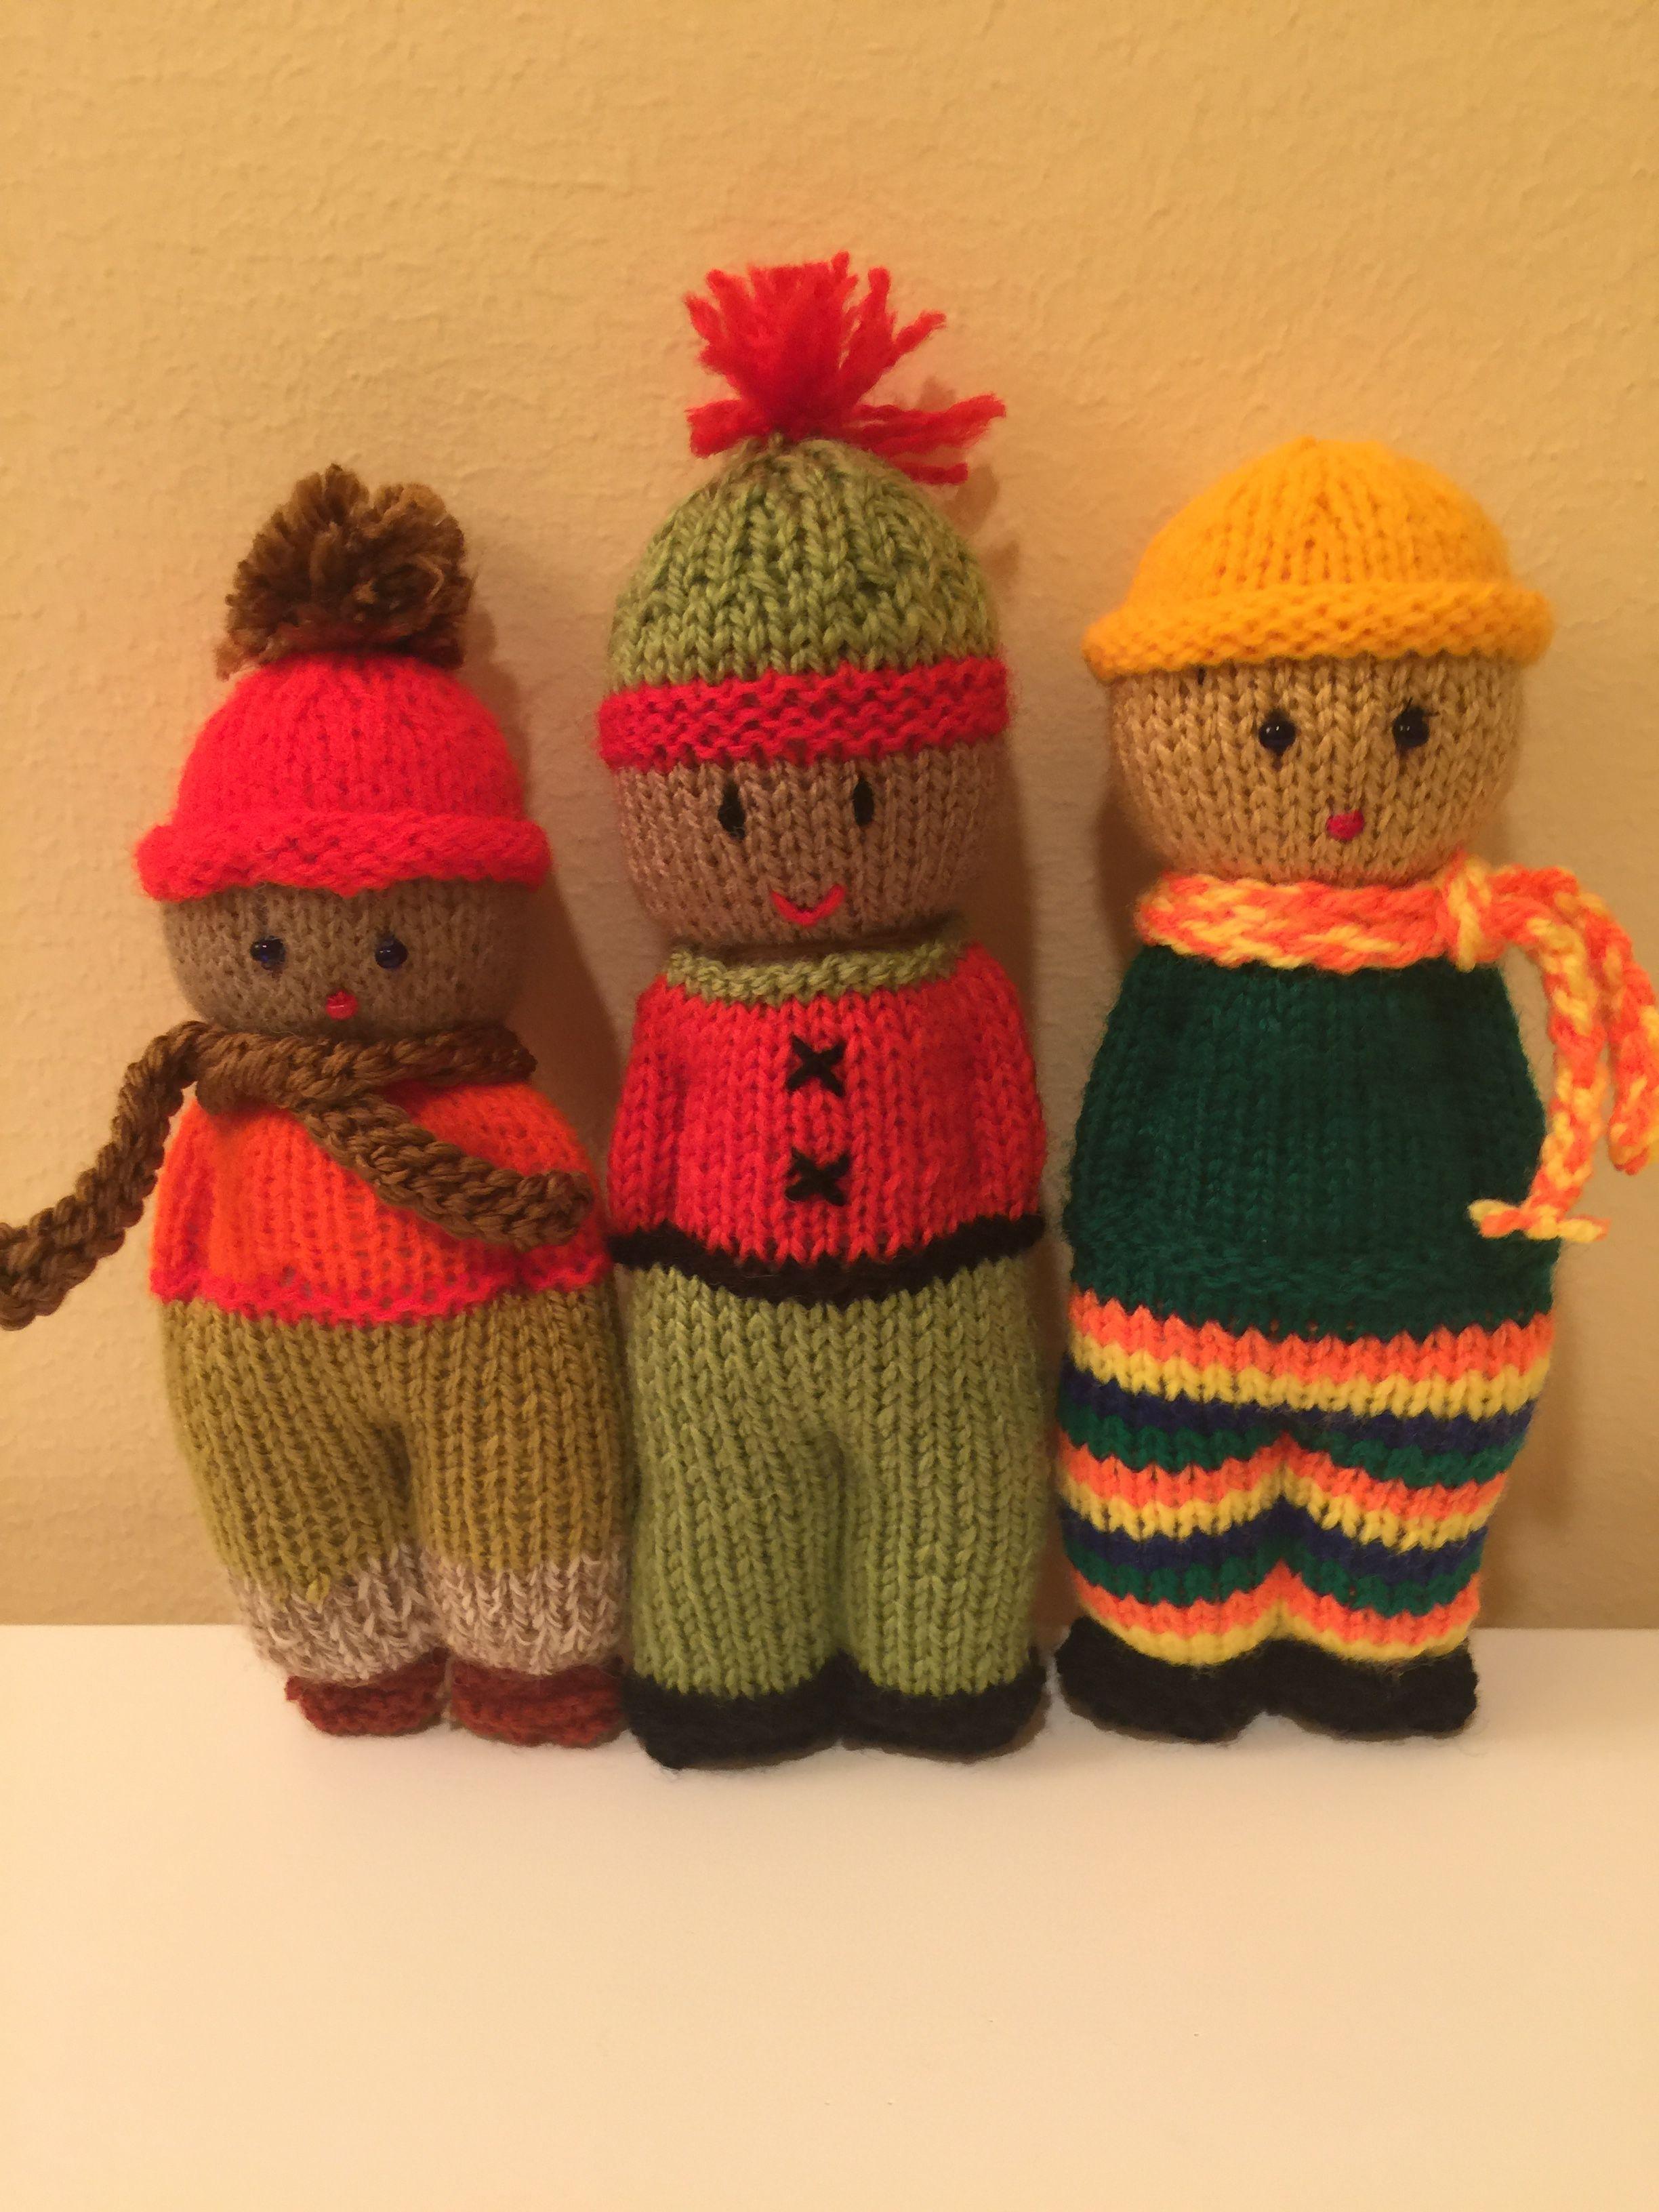 Pin de Barb Euker en knitted toys n dolls | Pinterest | Muñecas ...